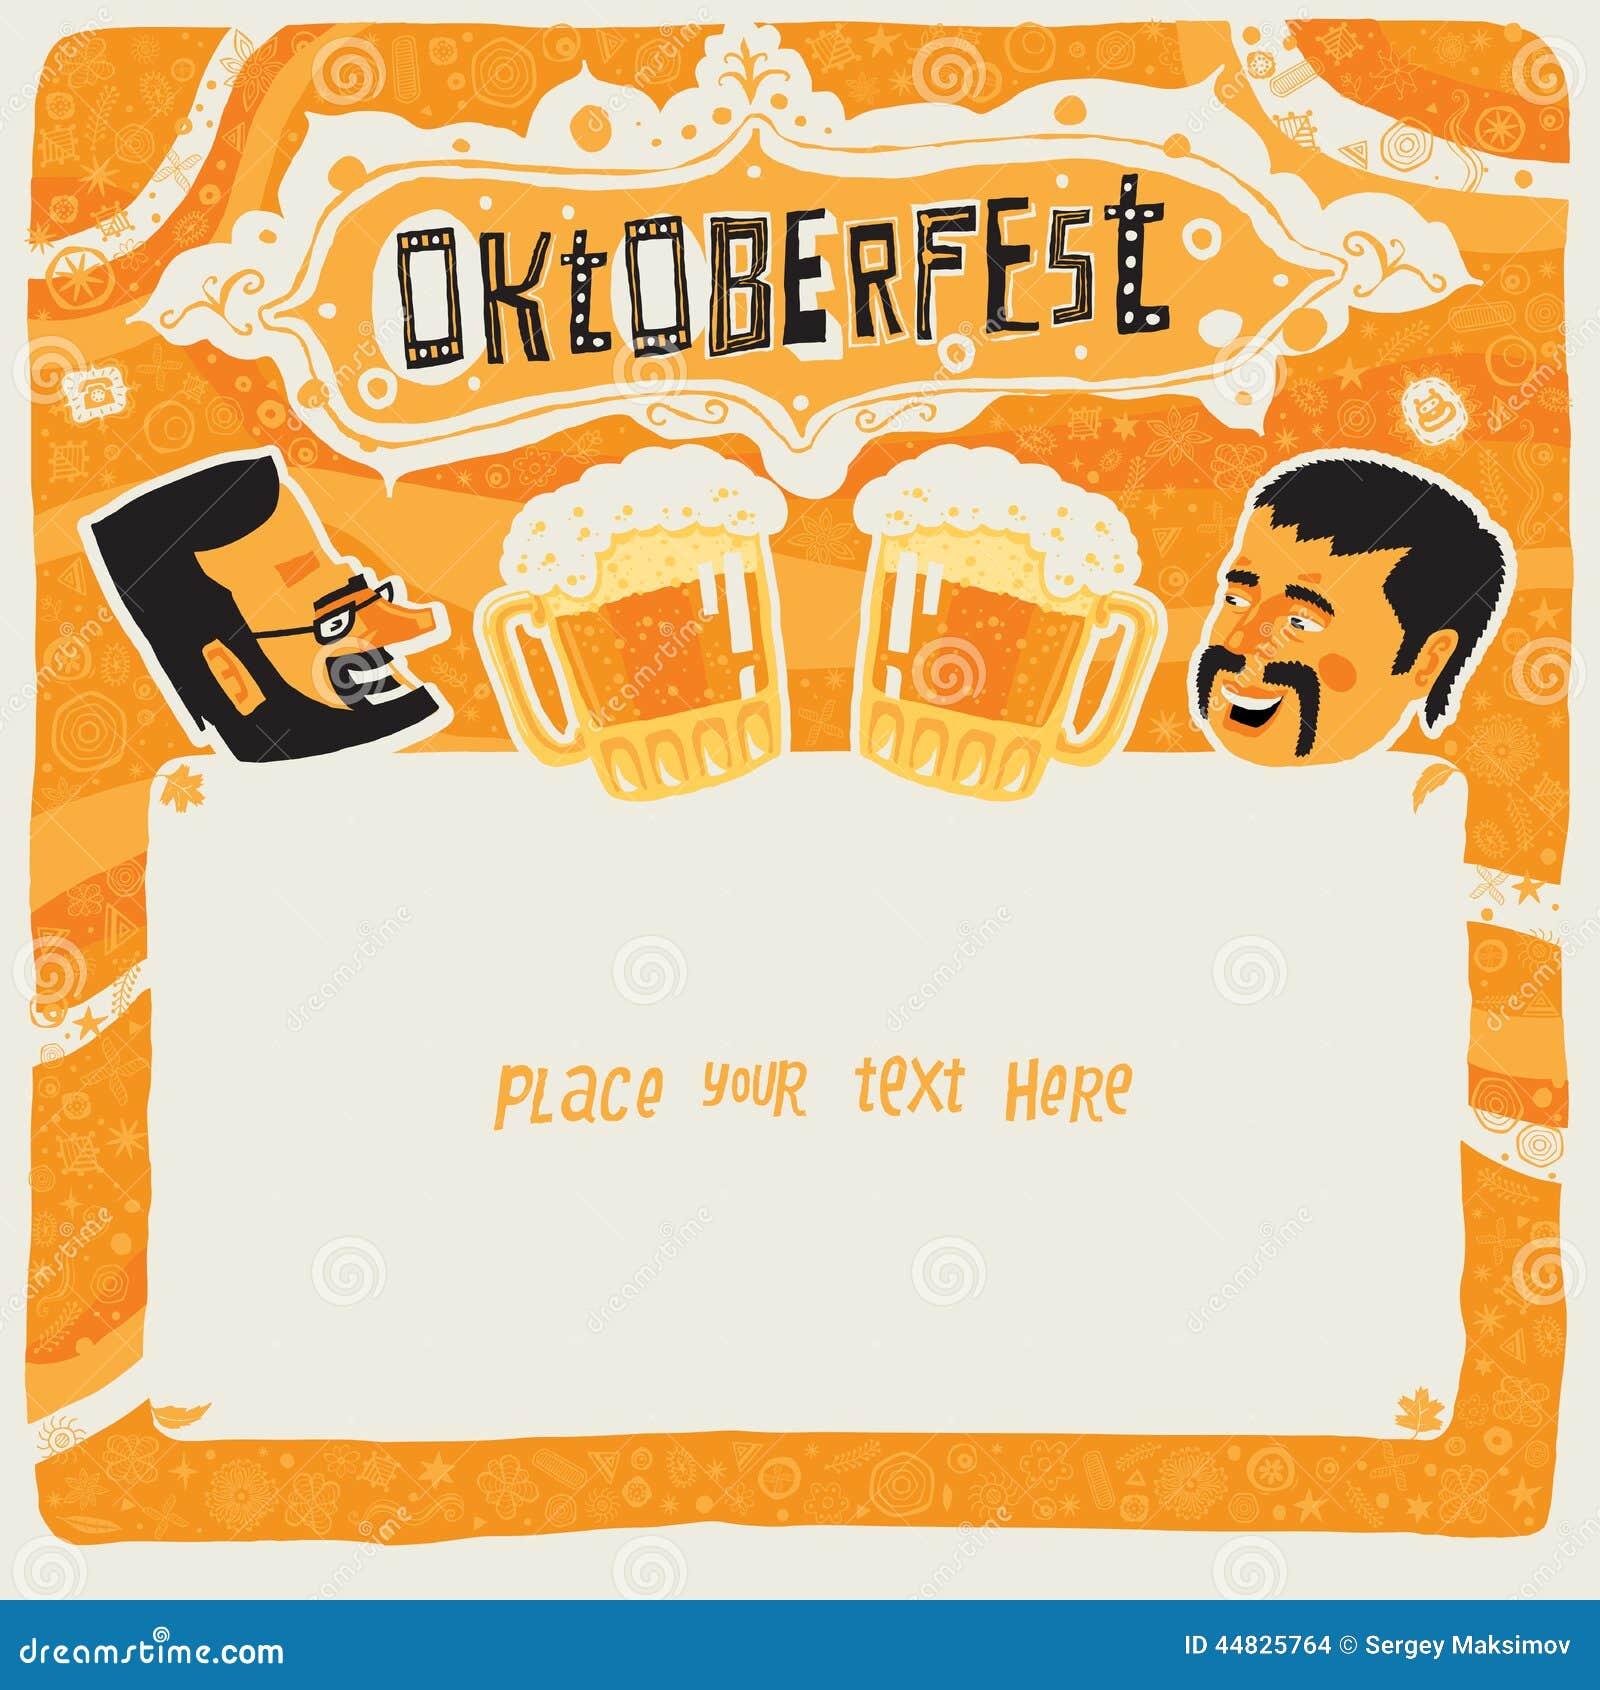 Oktoberfest Postcard Poster Background Ornament Or Party – Oktoberfest Party Invitations